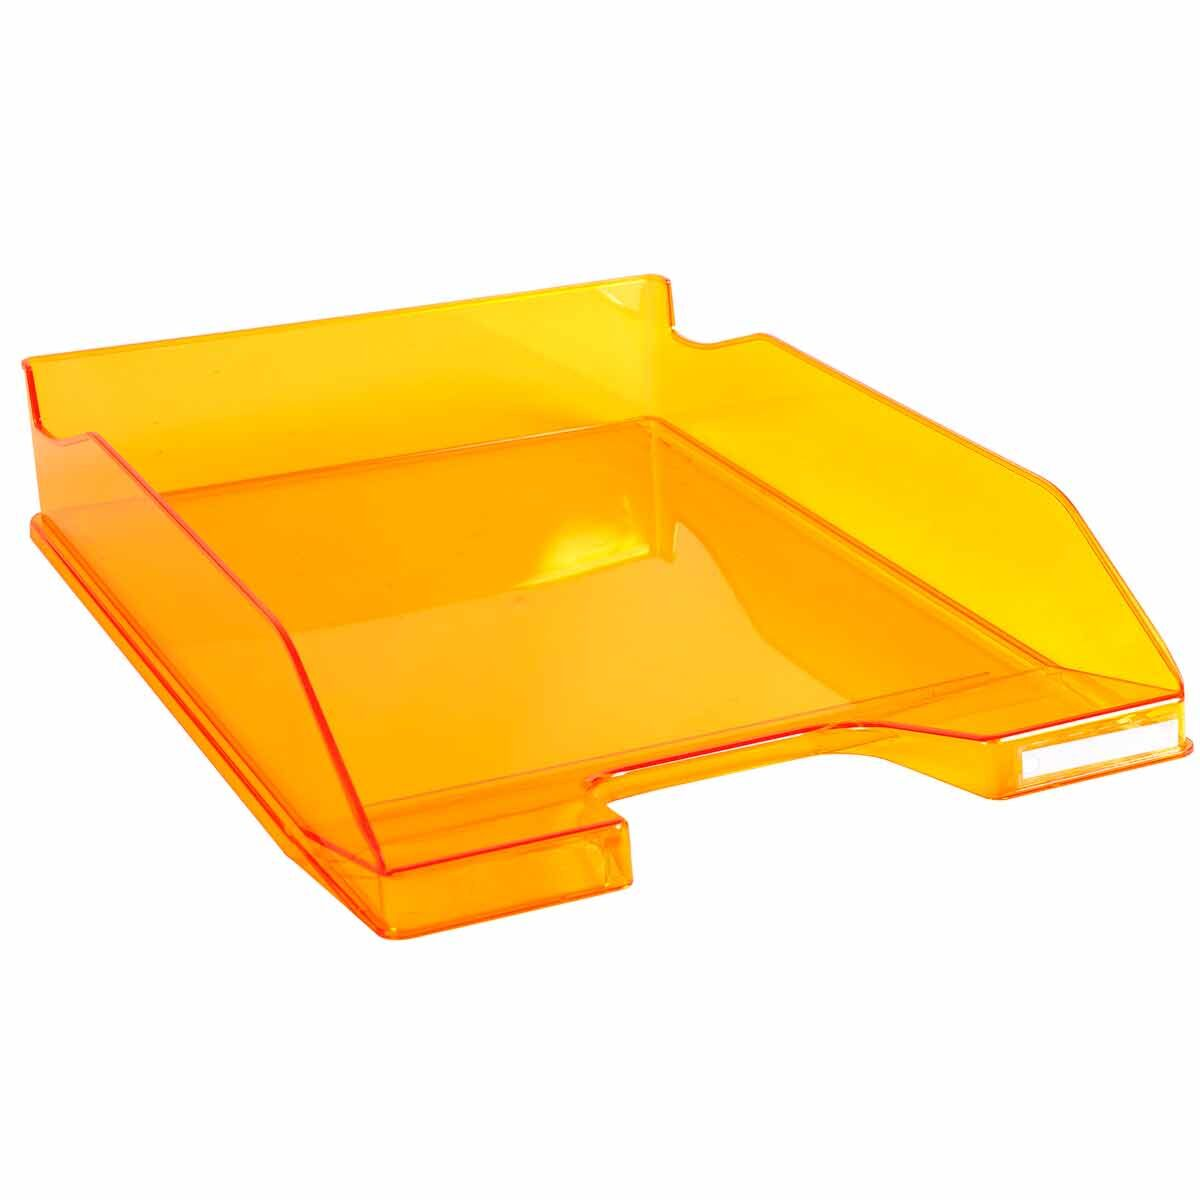 Exacompta Office Letter Tray Midi Combo Pack of 6 Translucent Gloss Mandarin